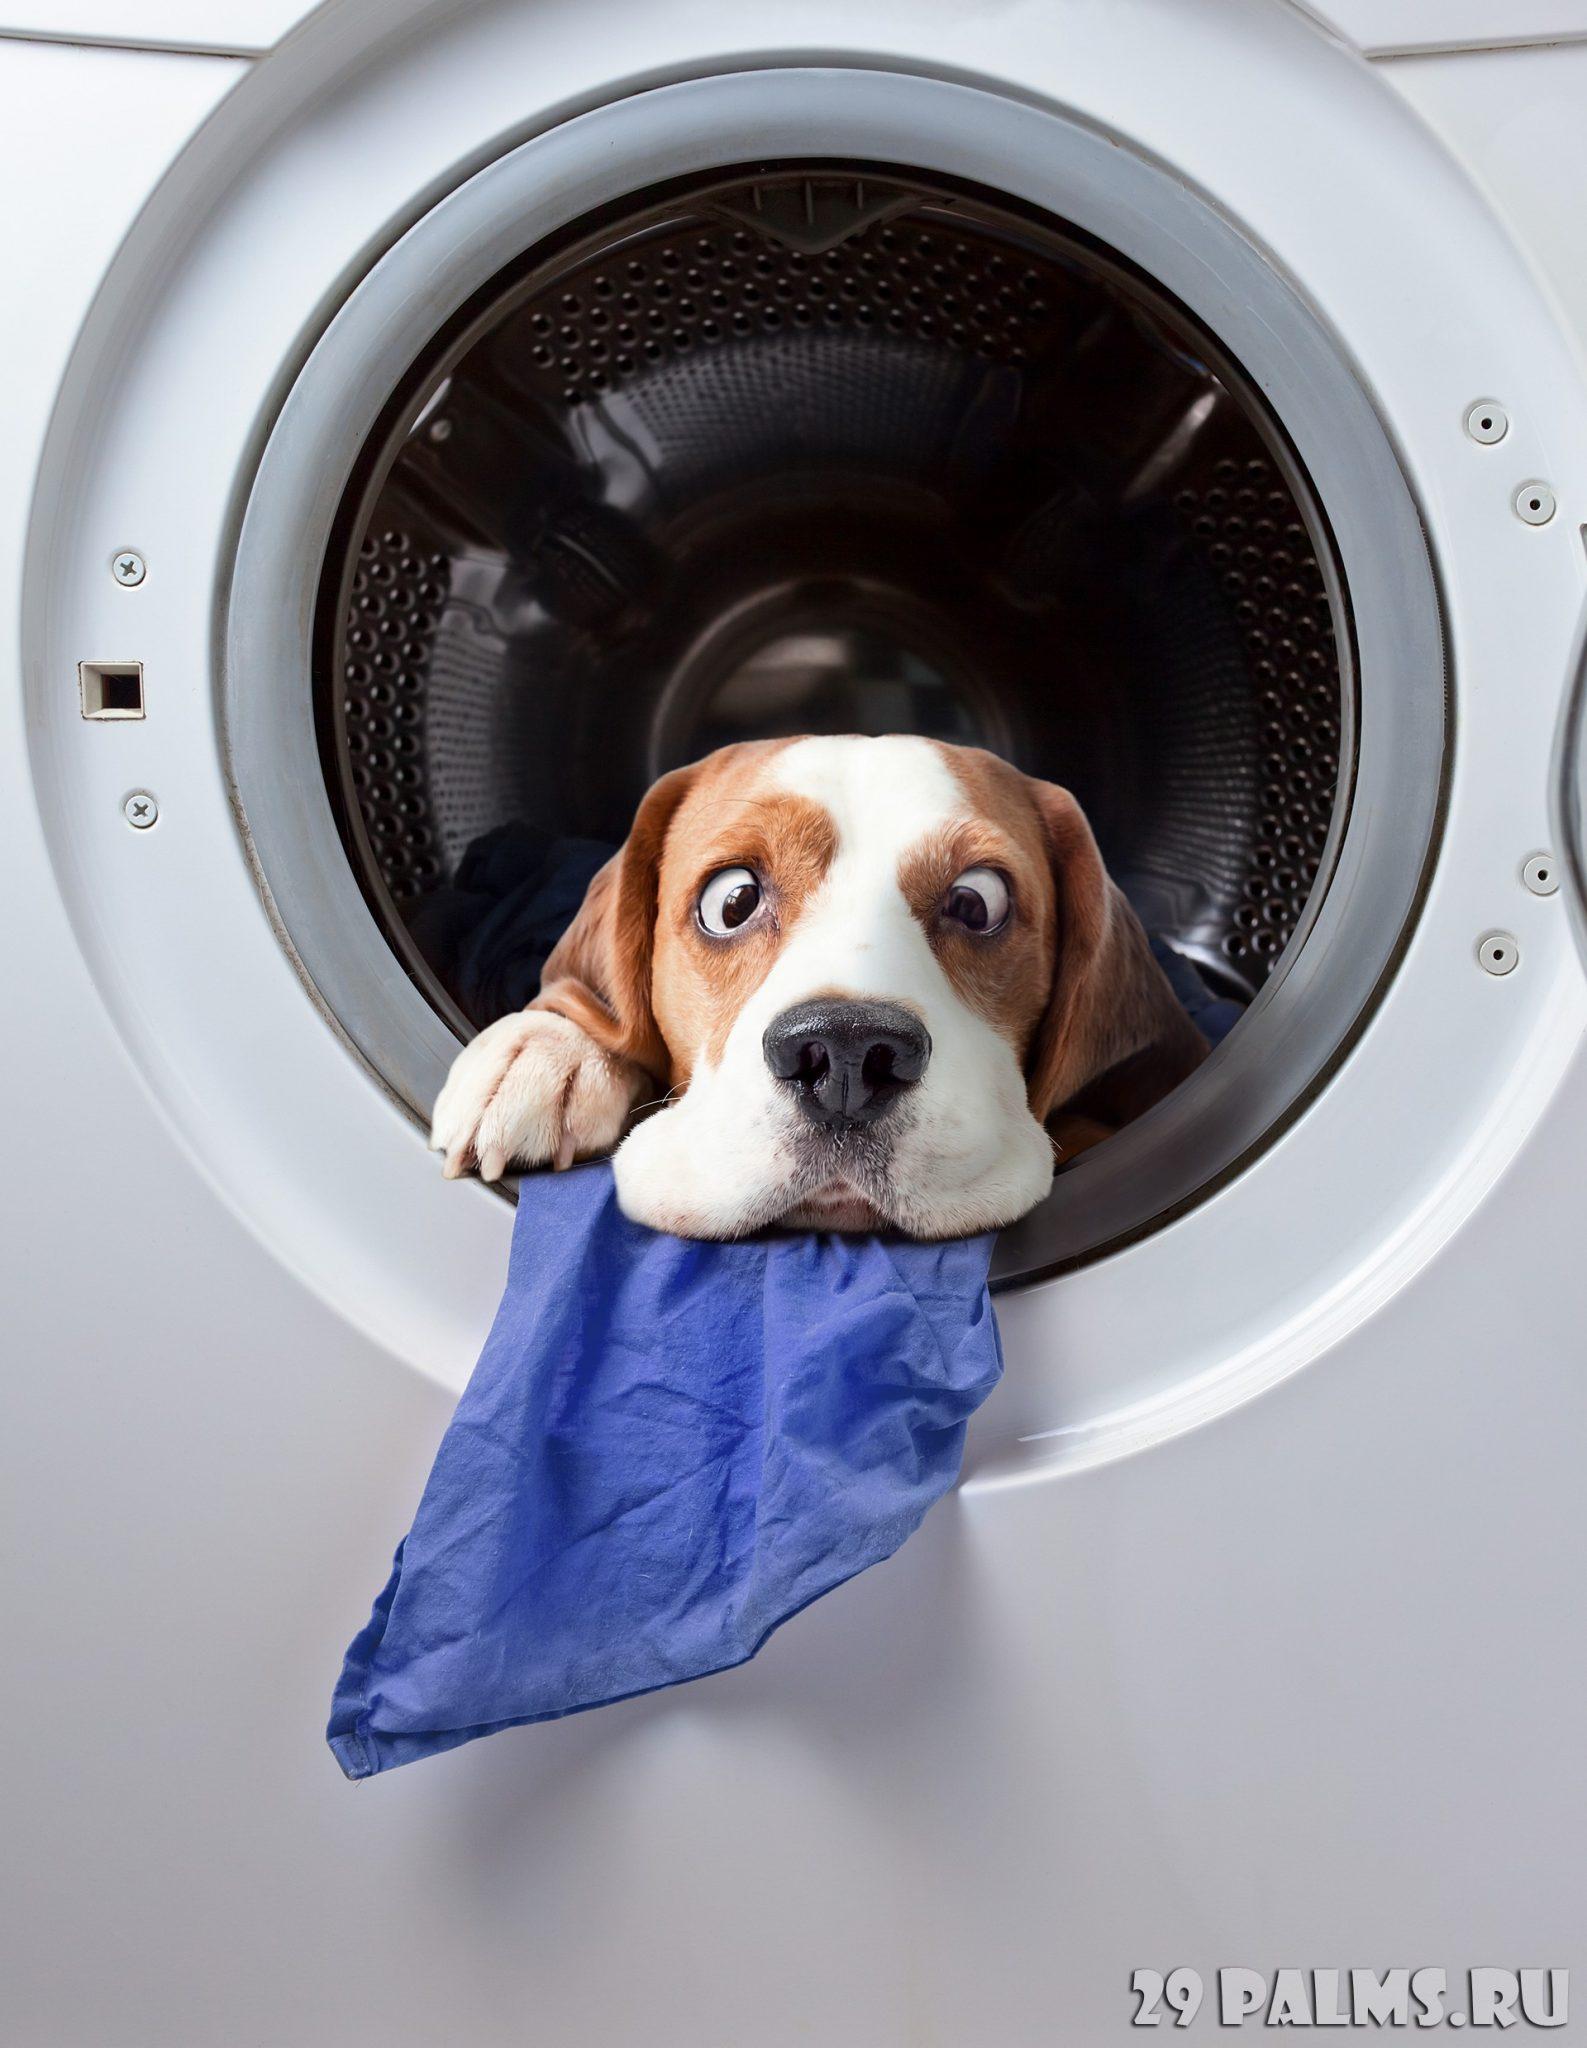 Dog after washing in a washing machine